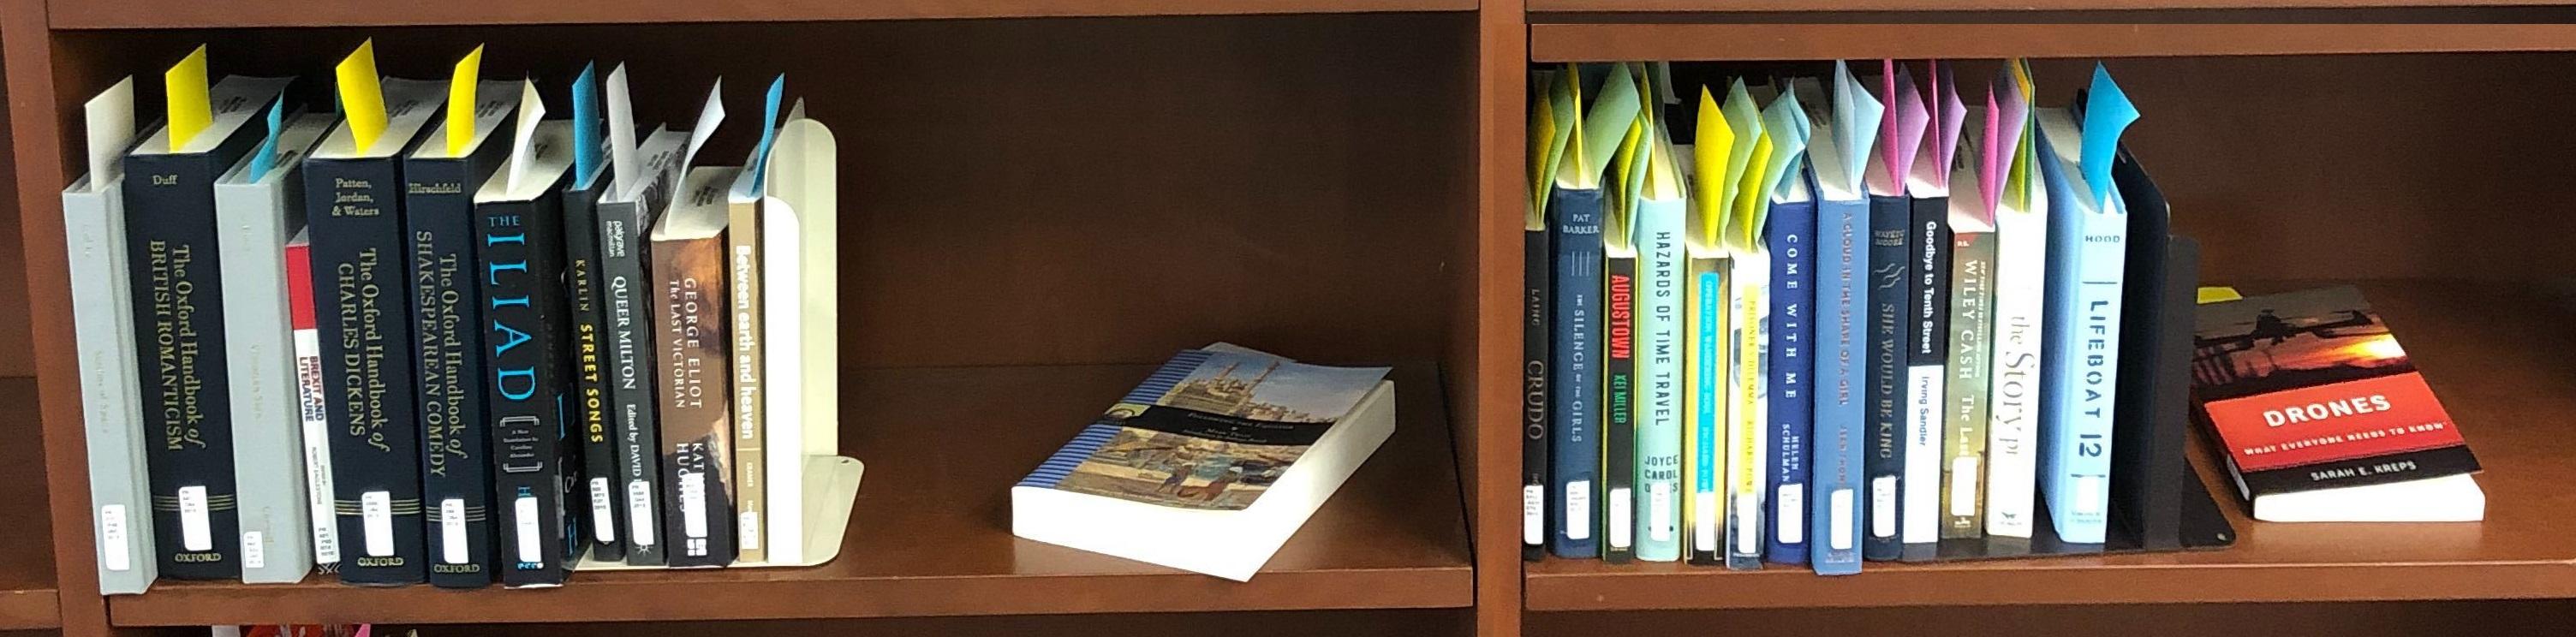 New Books display shelving